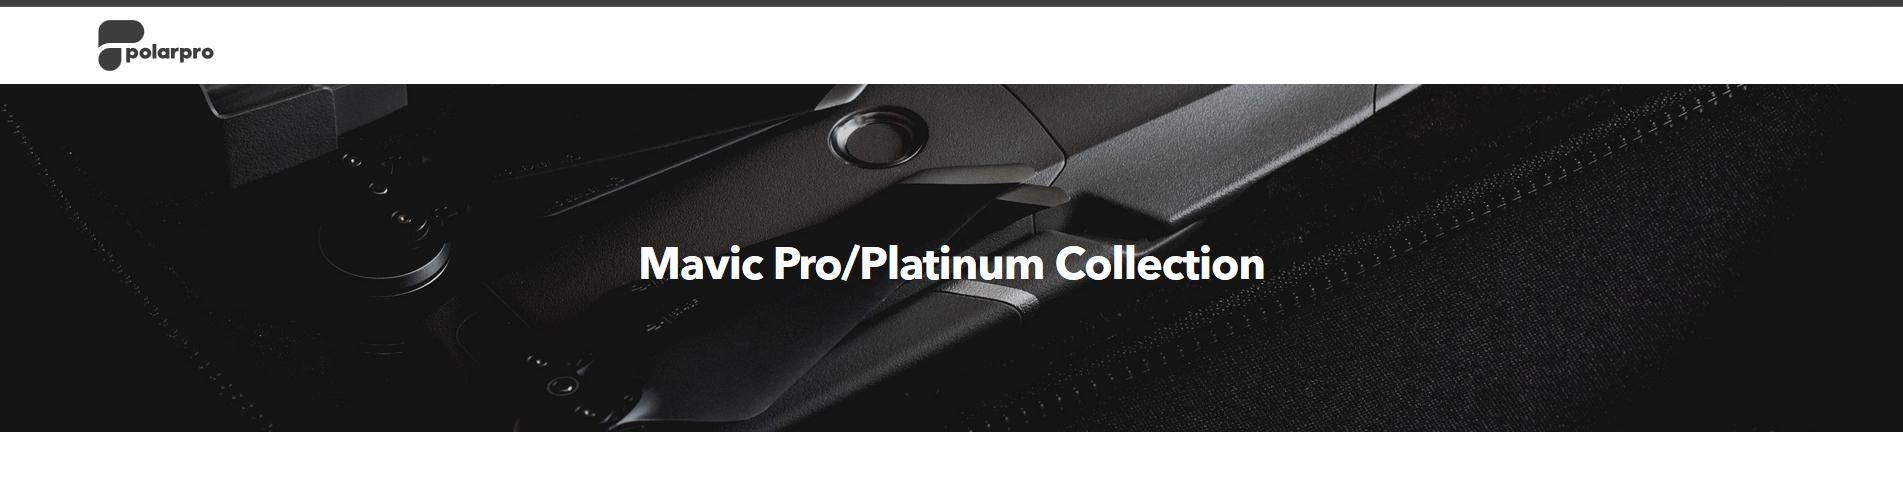 Mavic-Pro-platinum